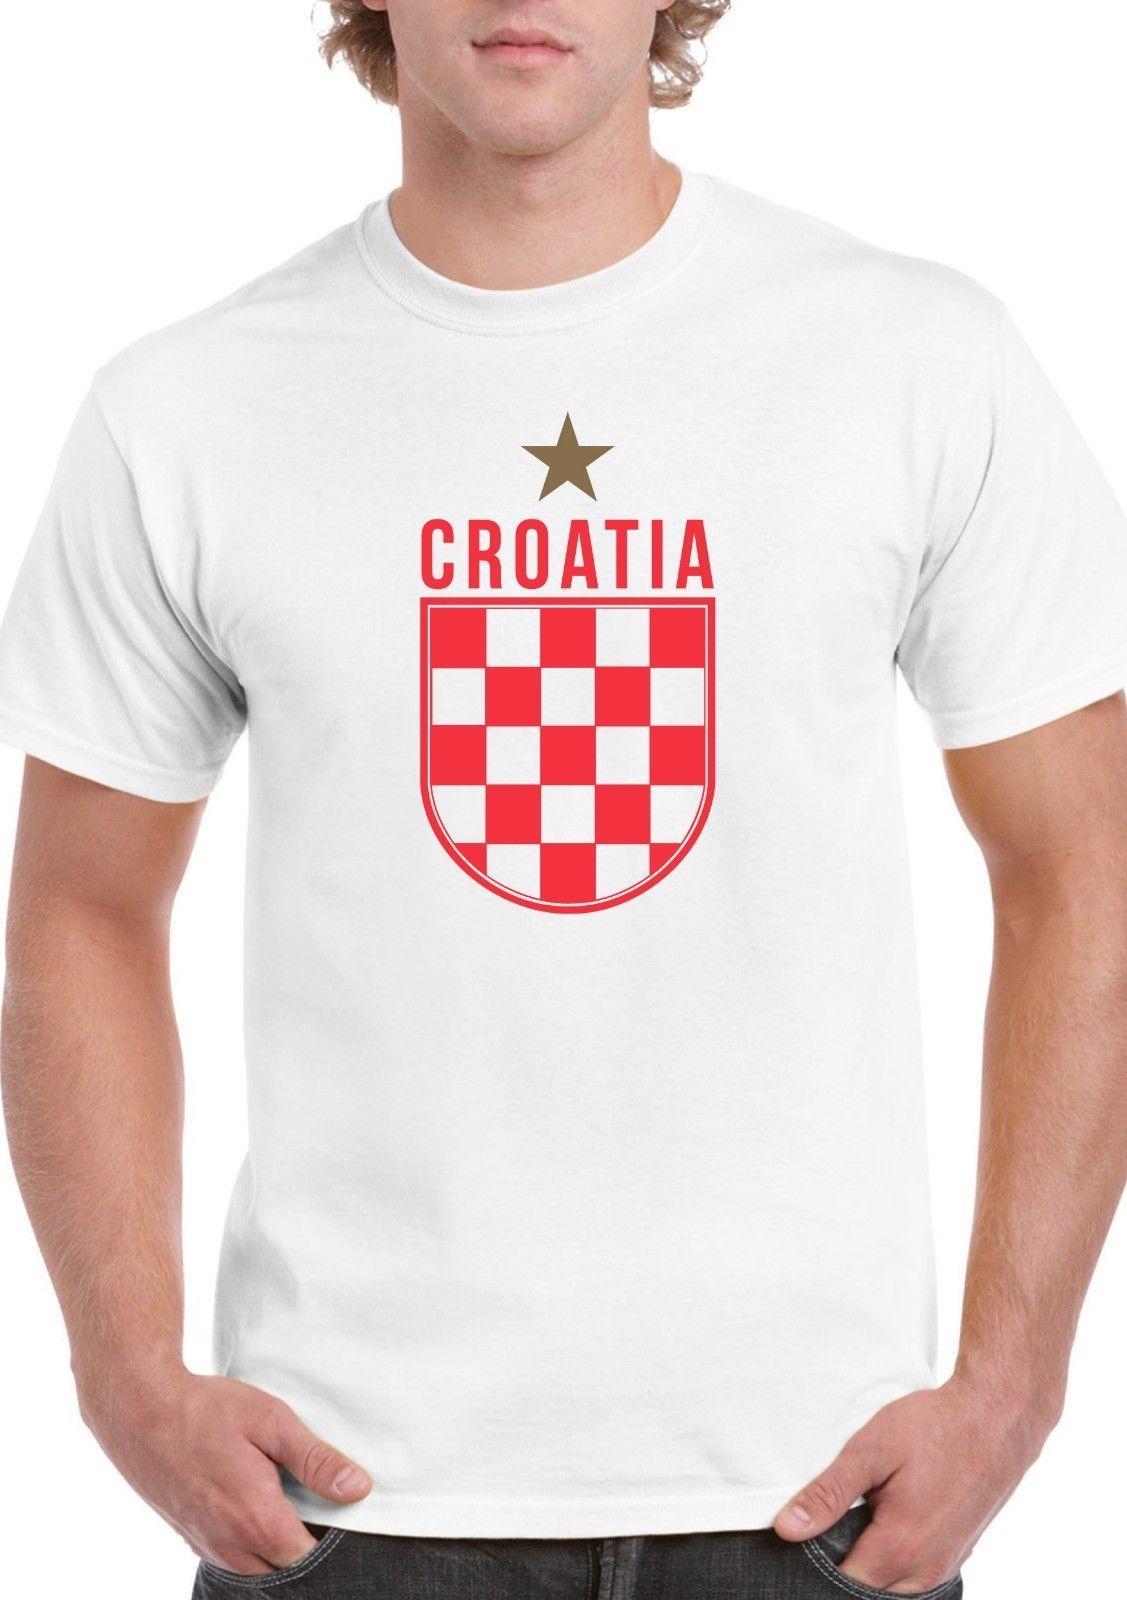 1fa6c747761 Croatia Gold Star T Shirt Croatian Red White Hrvatska World Men Women  Unisex Fashion Tshirt Funny Cool Top Tee White Design T Shirts Online Order T  Shirts ...